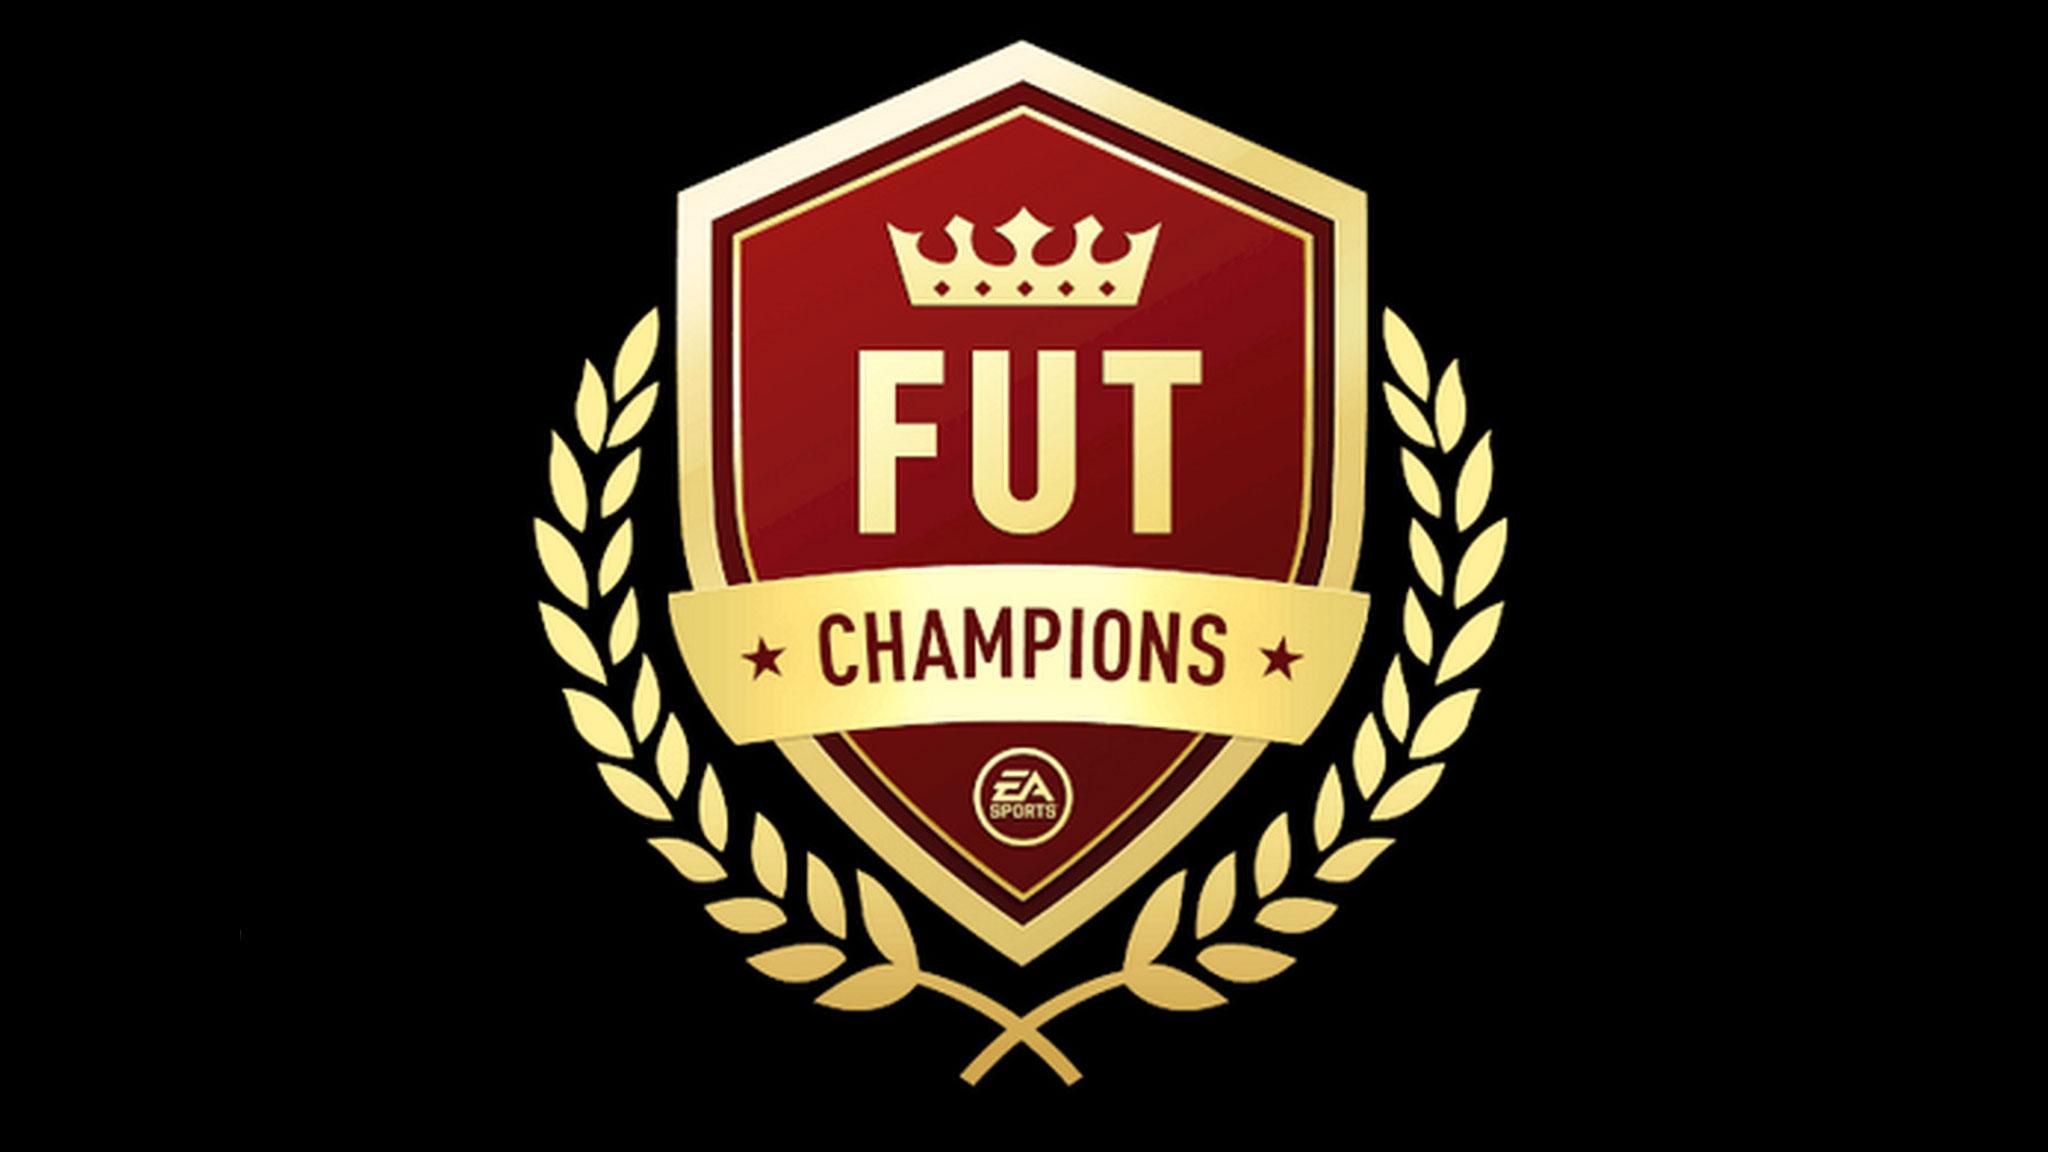 Brisanter Leak: Drängt EA FIFA-Spieler gezielt in den FUT-Modus?